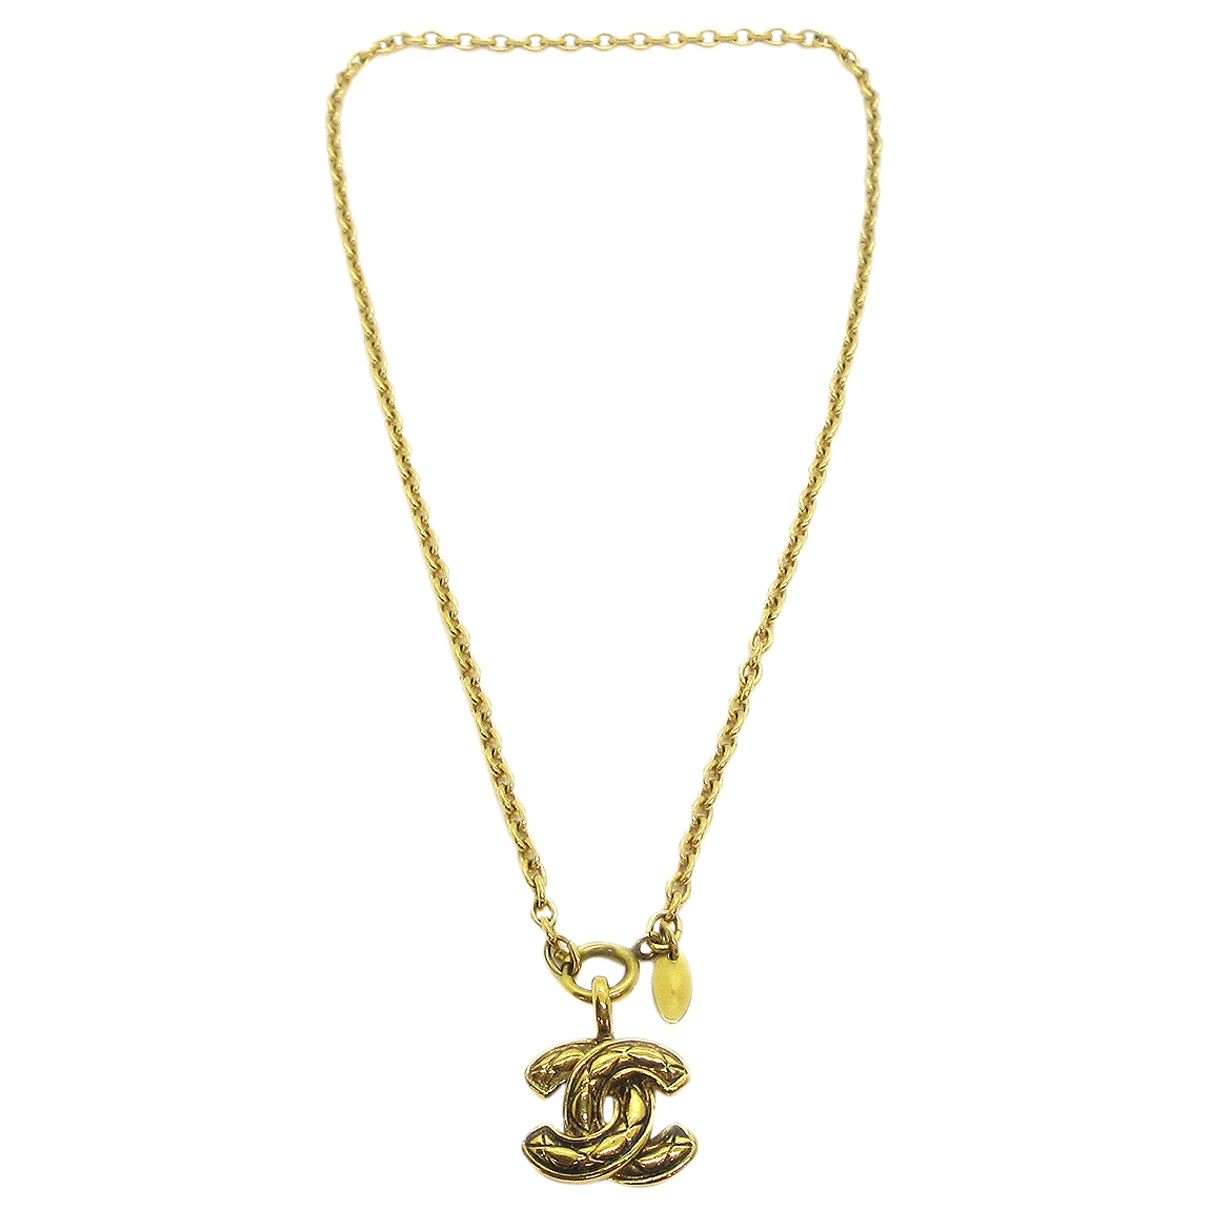 Collar Chanel